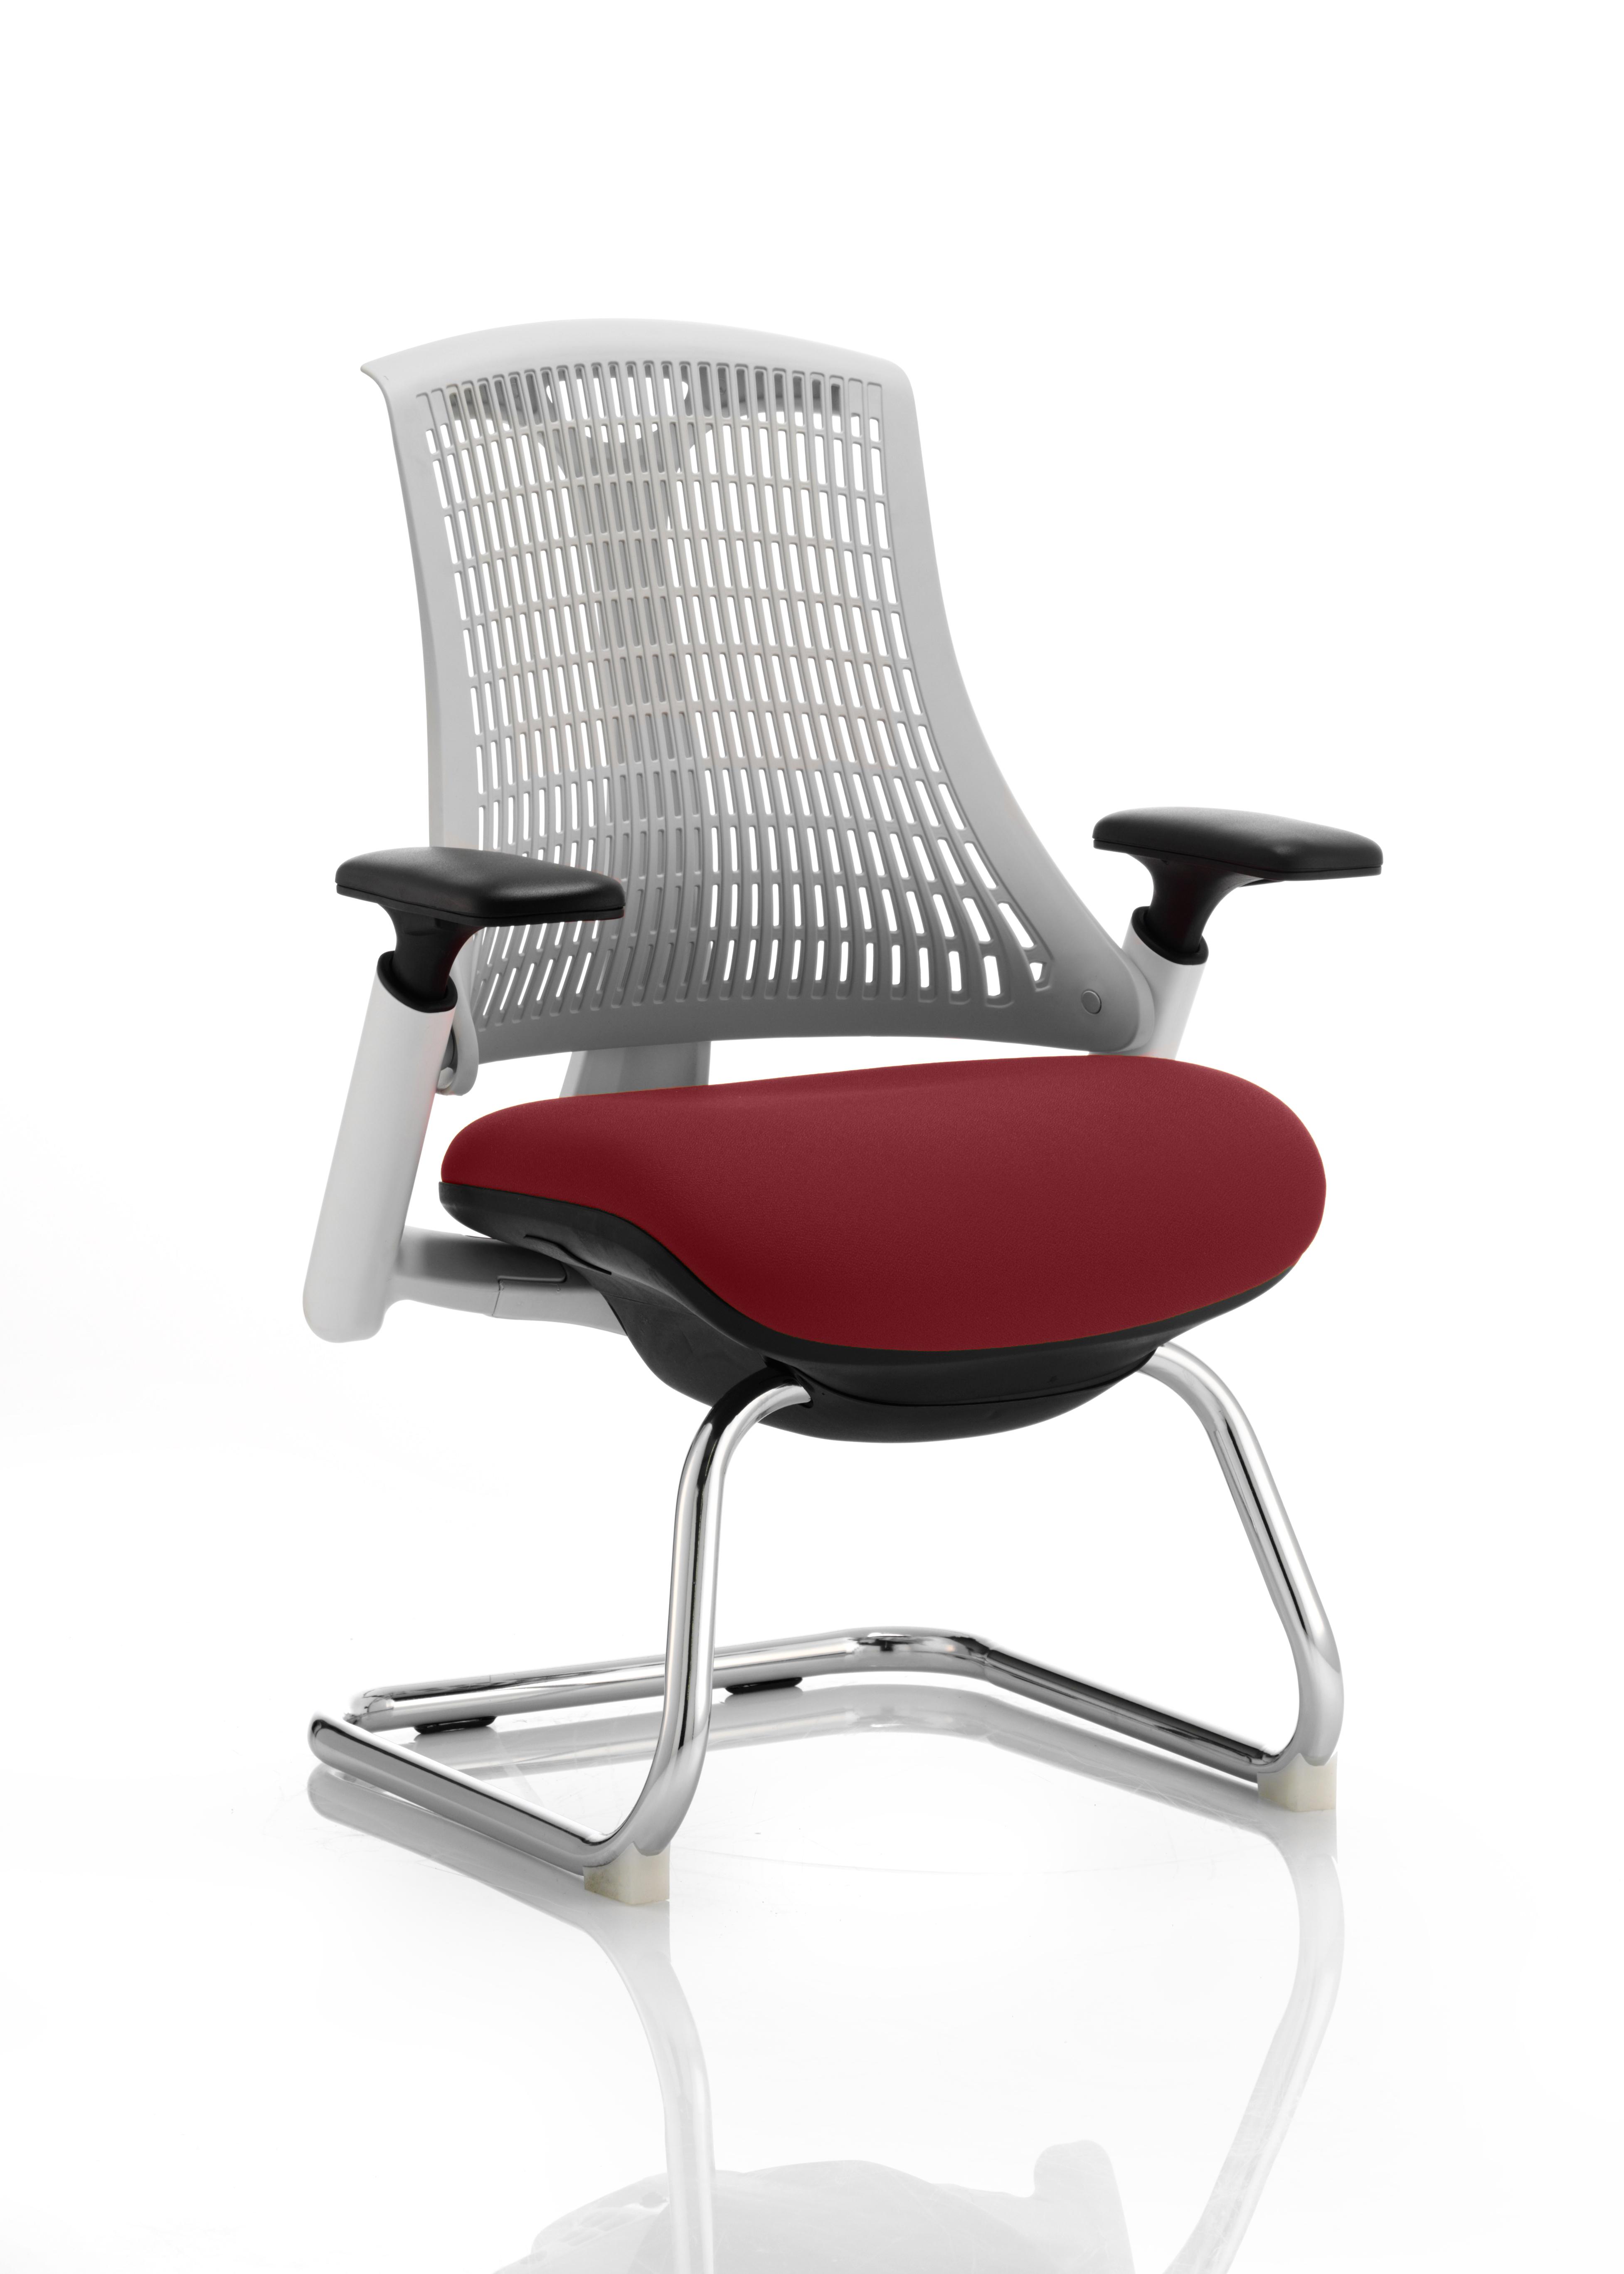 Flex Cantilever Chair White Frame White Back Bespoke Colour Seat Ginseng Chilli